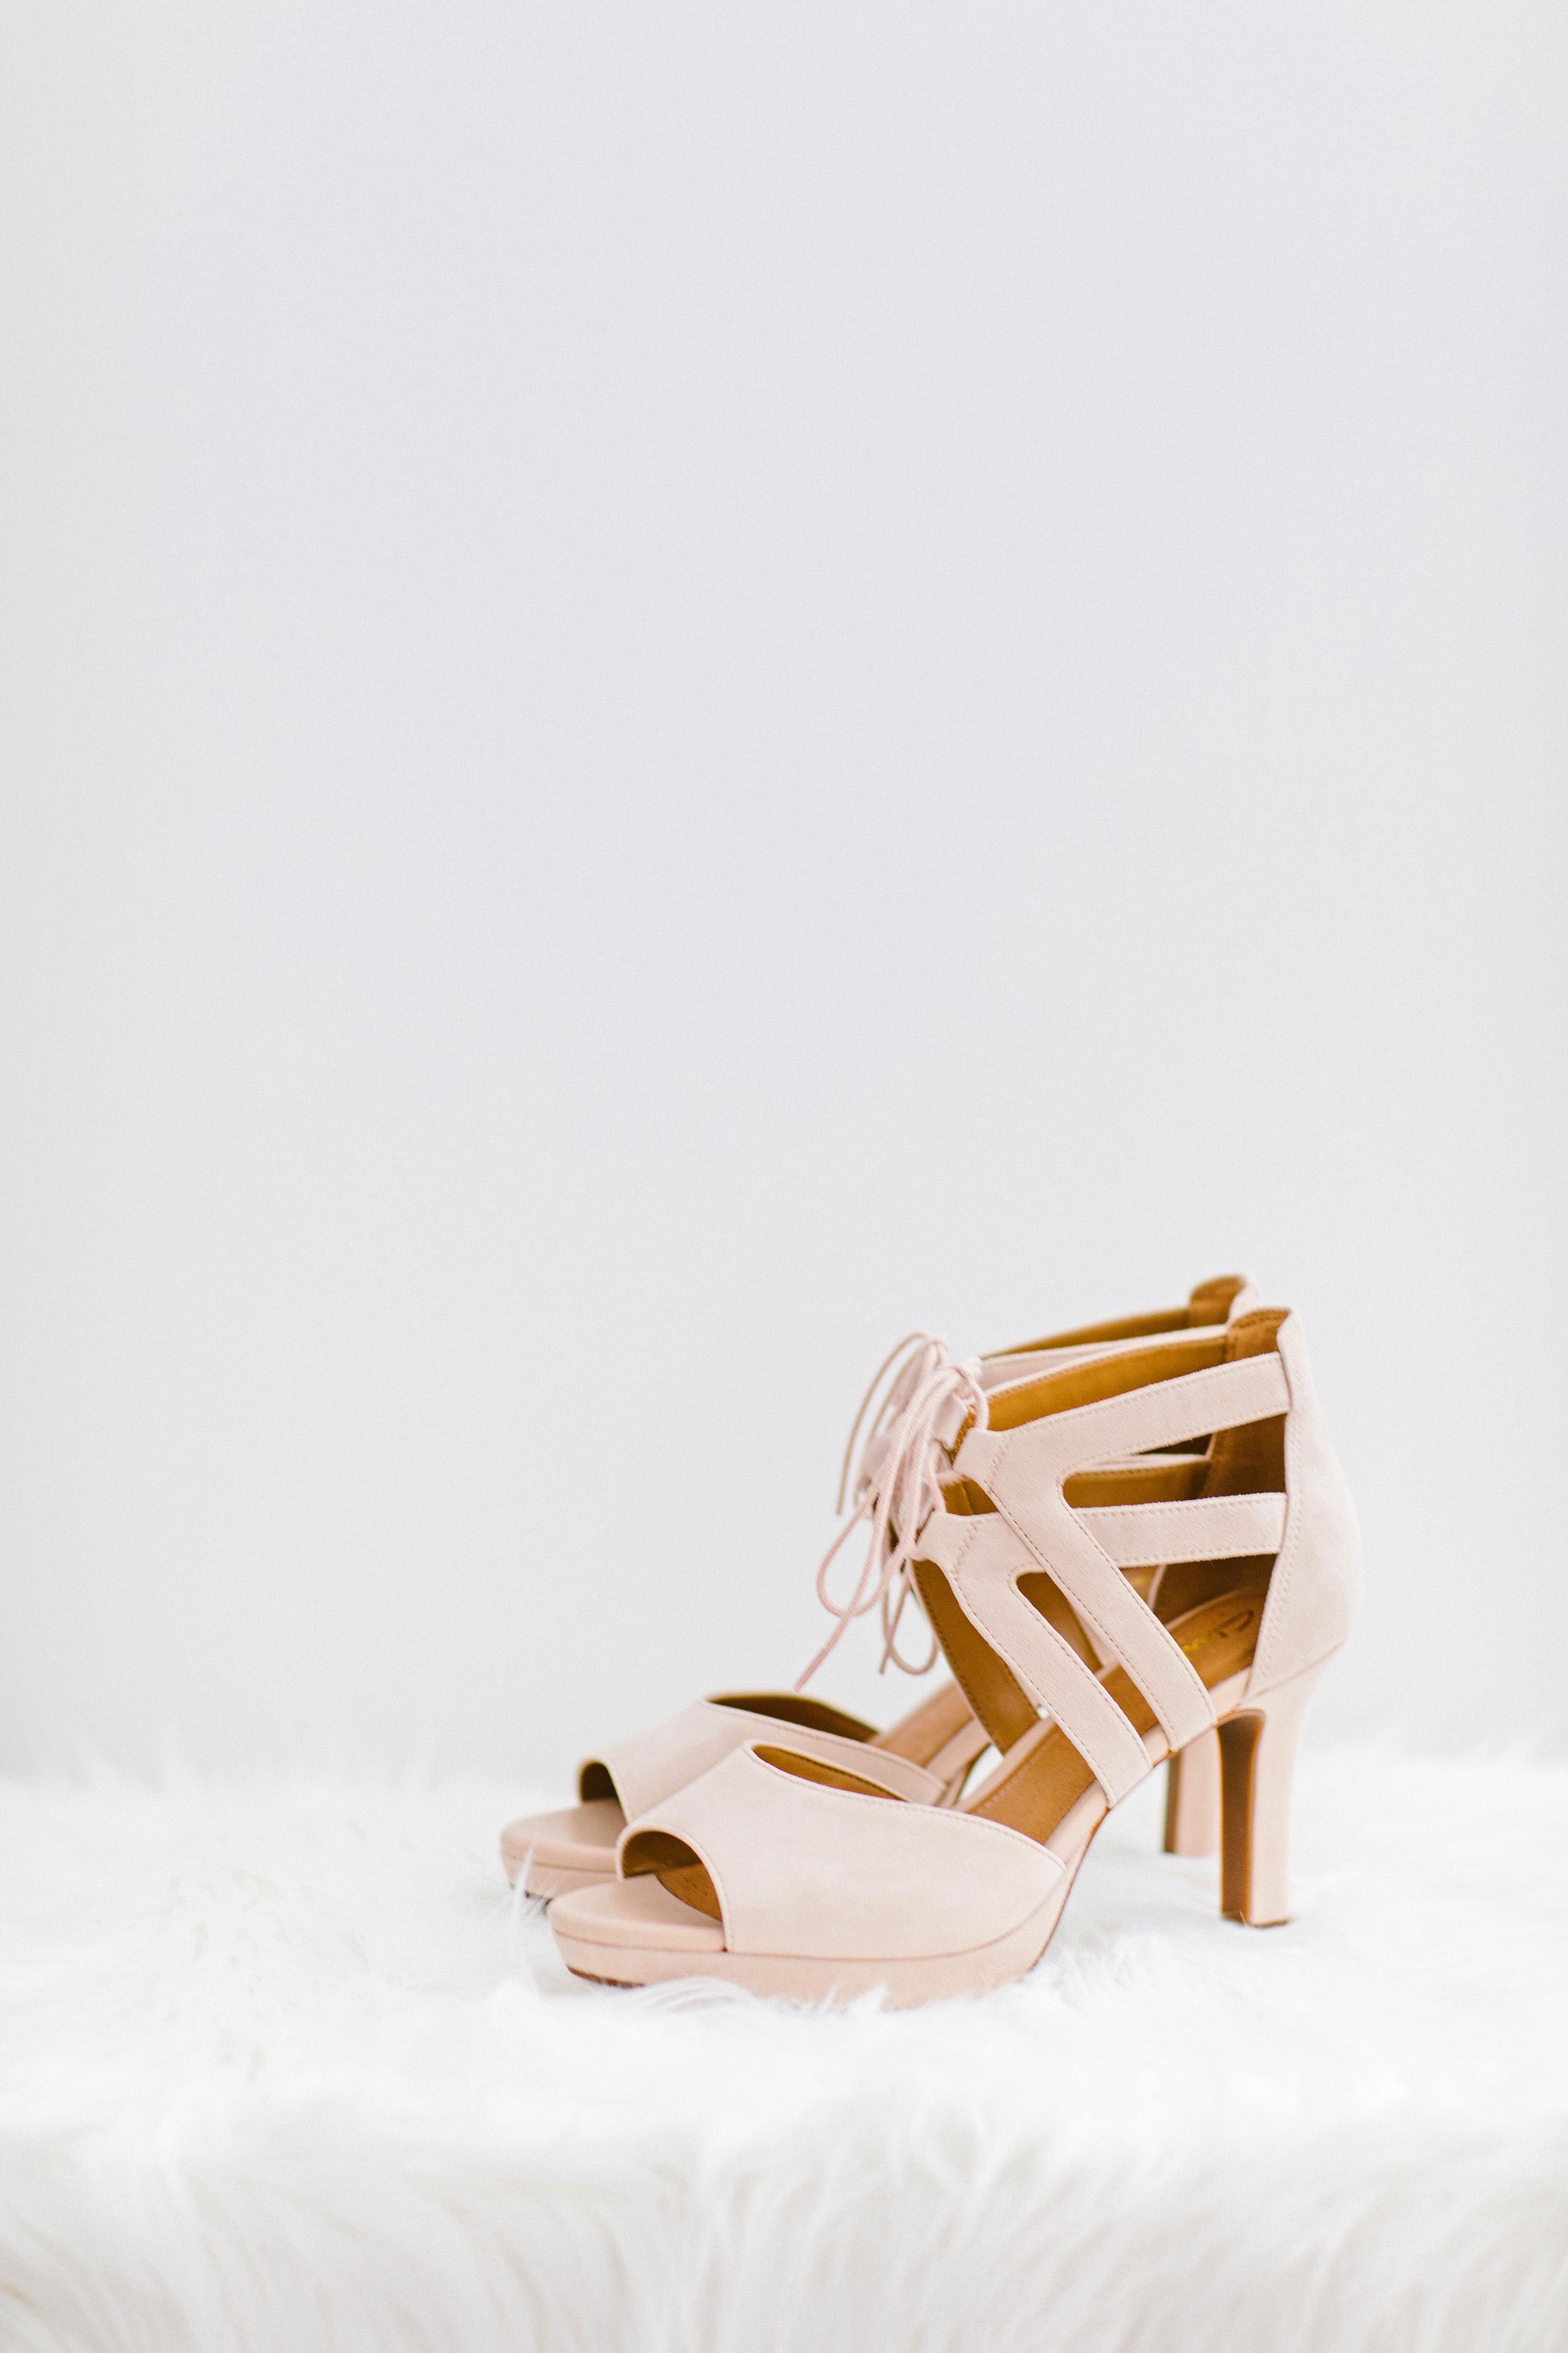 sara ryan wedding philadelphia shoes